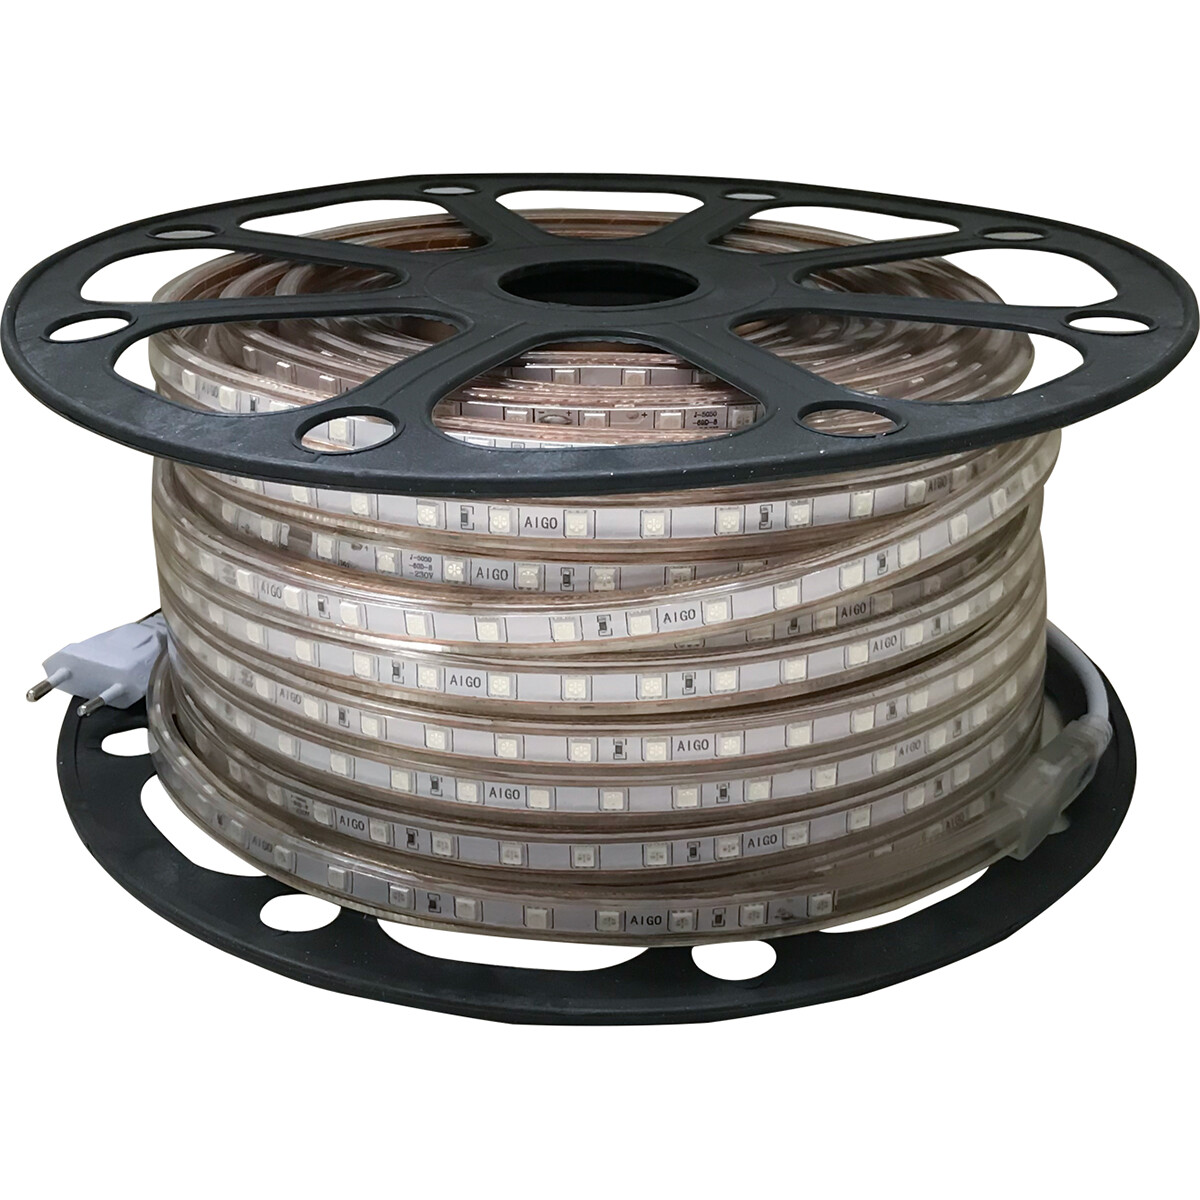 LED Strip - Aigi Strabo - 50 Meter - Dimbaar - IP65 Waterdicht - Blauw - 5050 SMD 230V